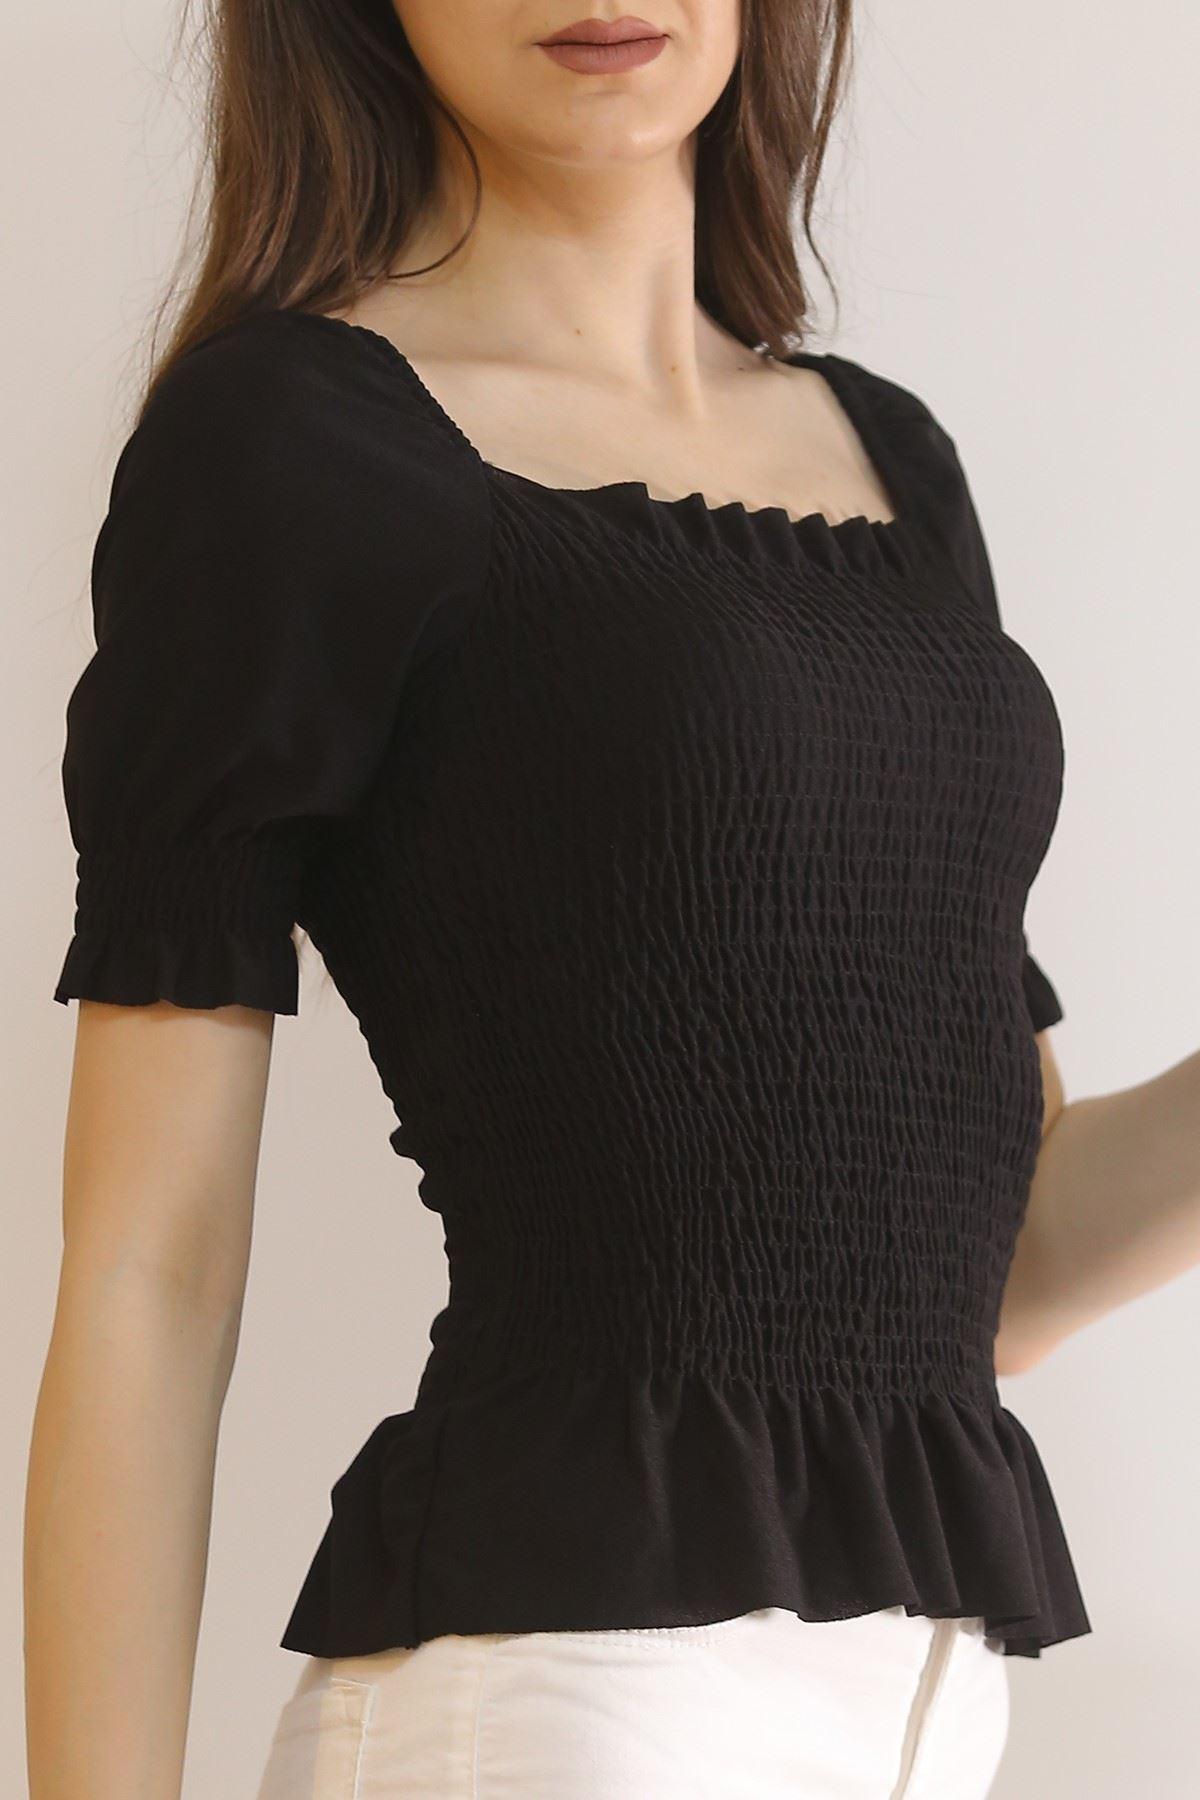 Gipeli Bluz Siyah - 6704.224.